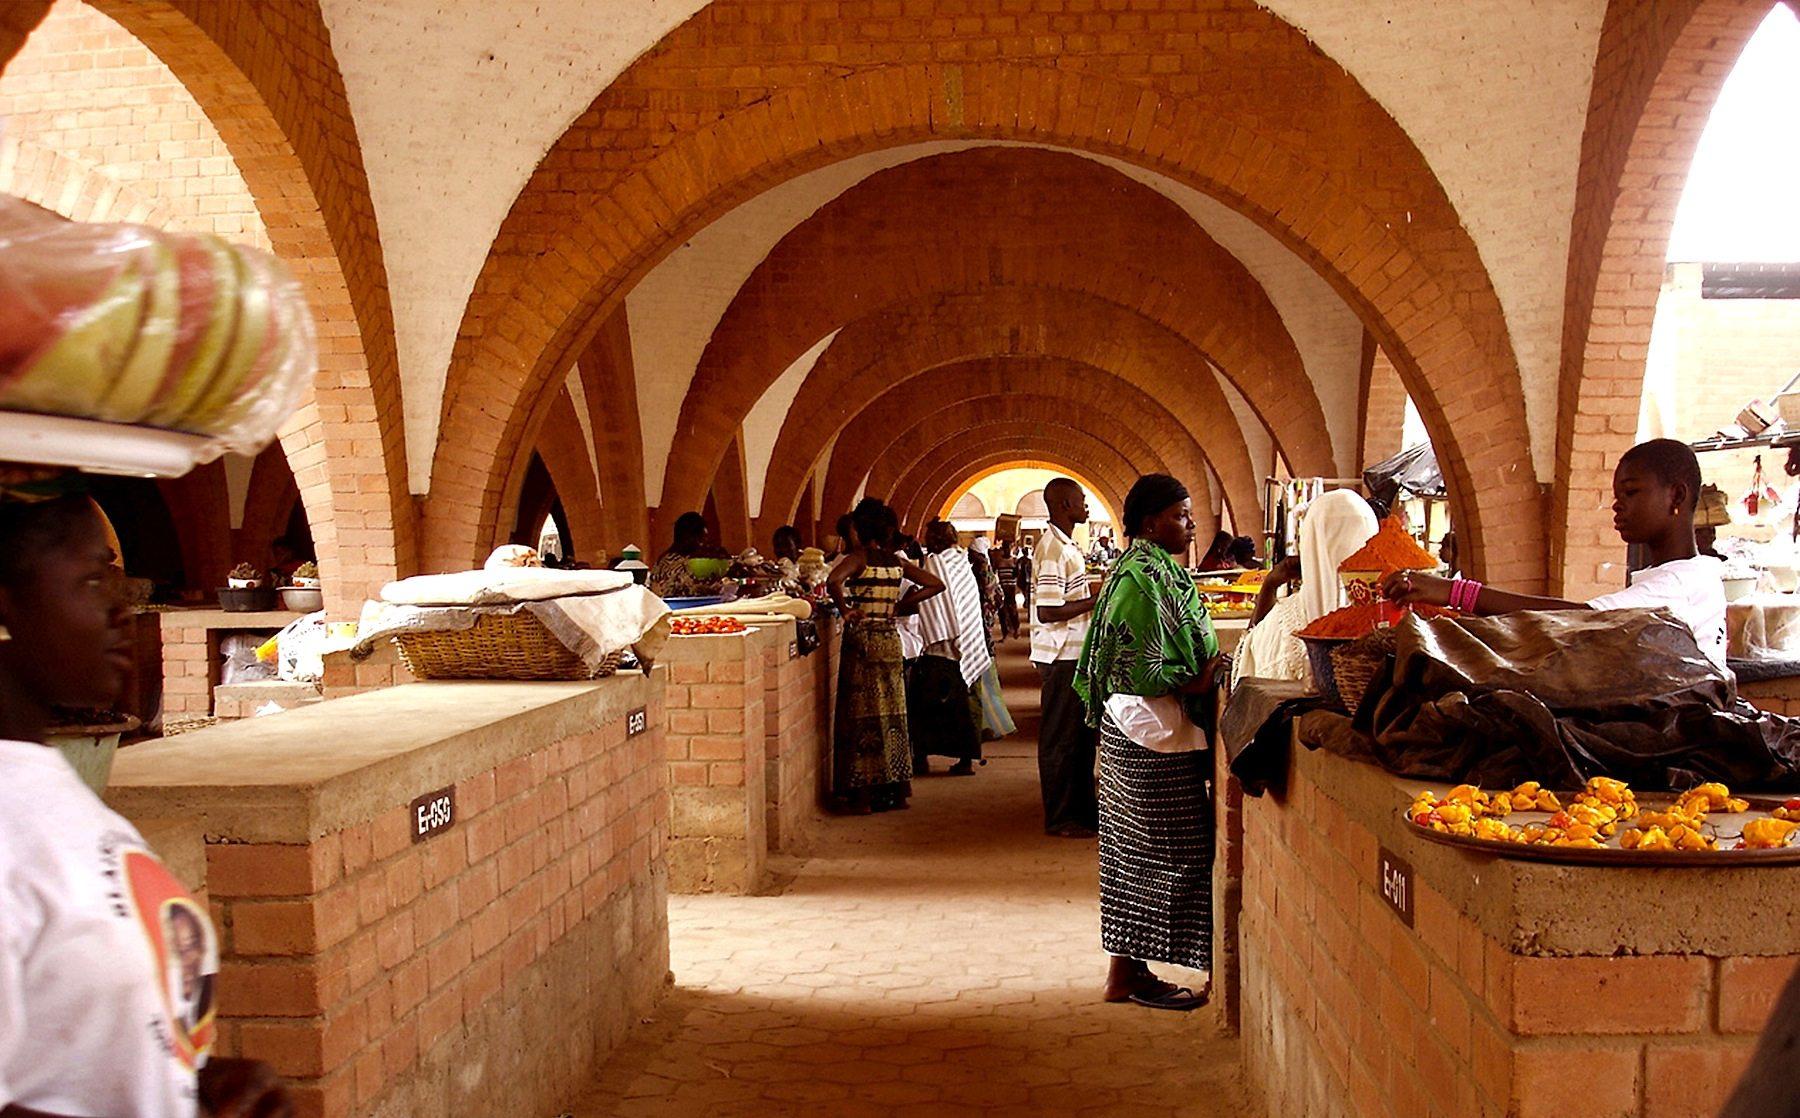 Zentraler Markt. In Koudougou, Burkina Faso, von Laurent Séchaud und Pierre Jequier